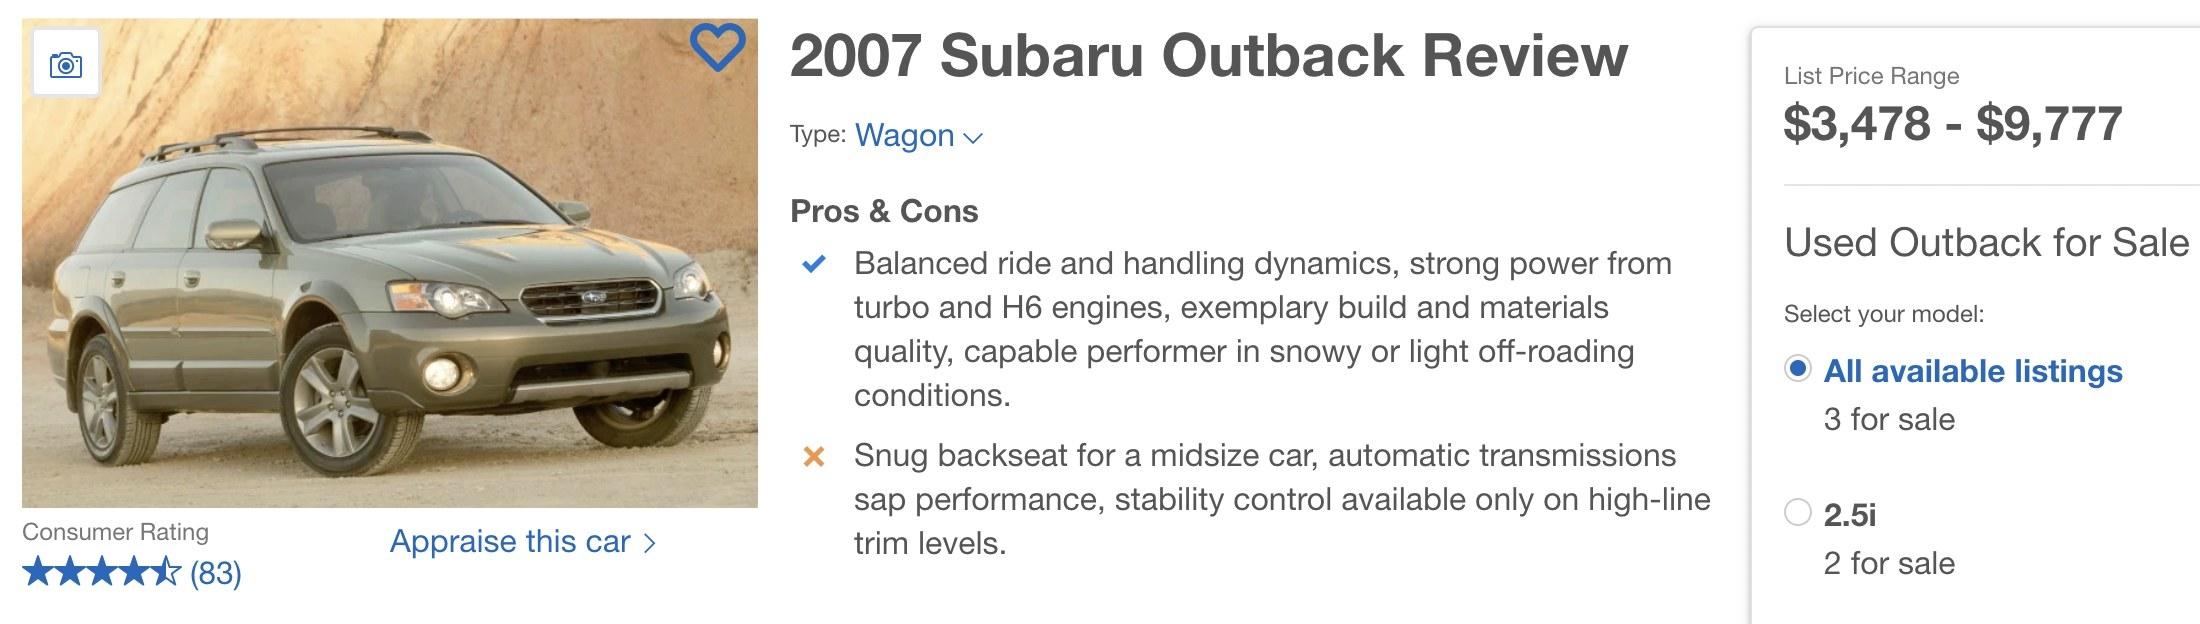 Screenshot of a Subaru Outback